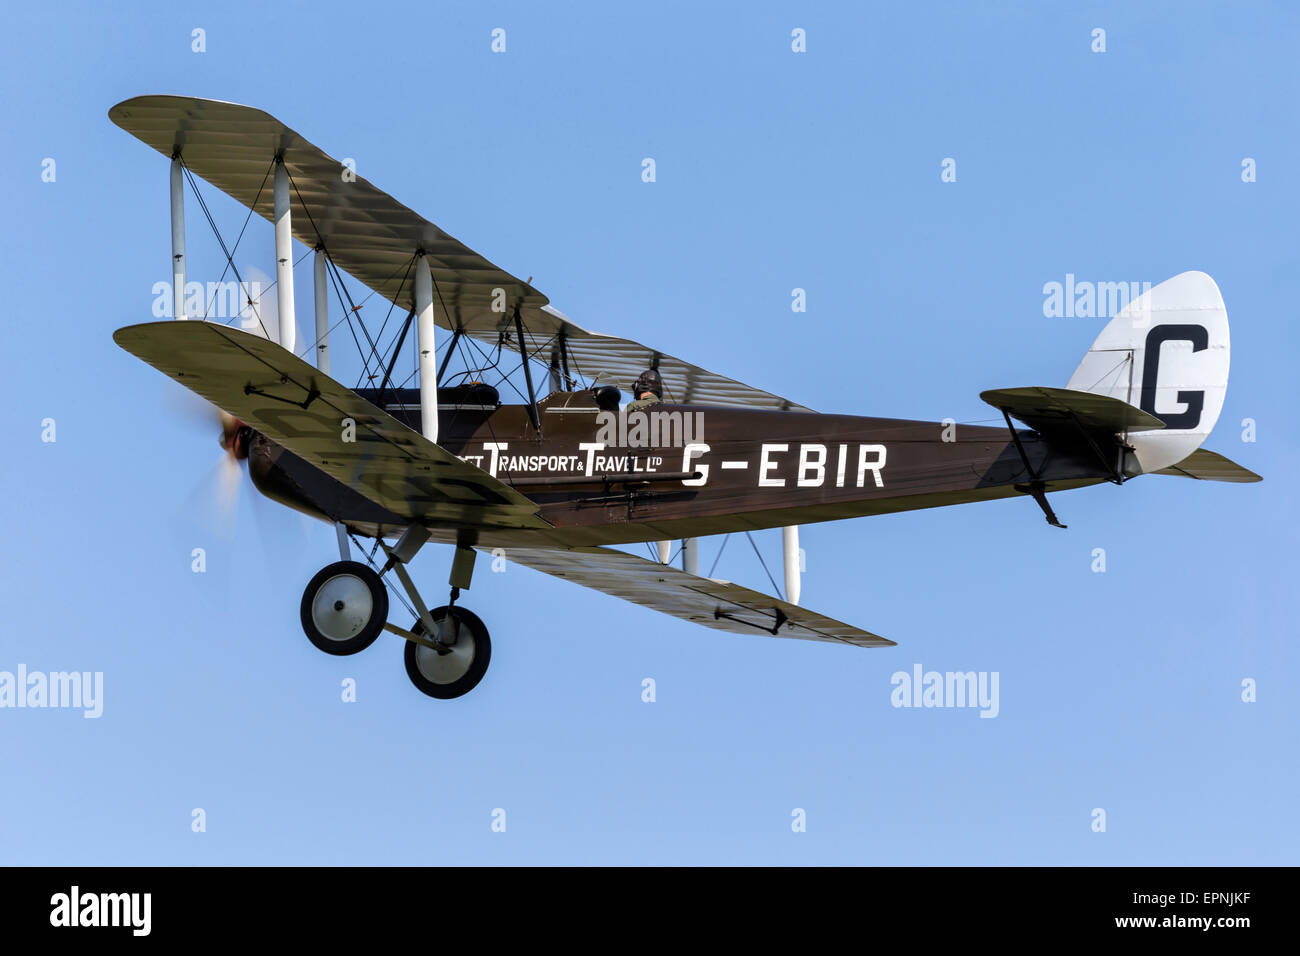 The rare De Havilland DH51 Miss Kenya - Stock Image